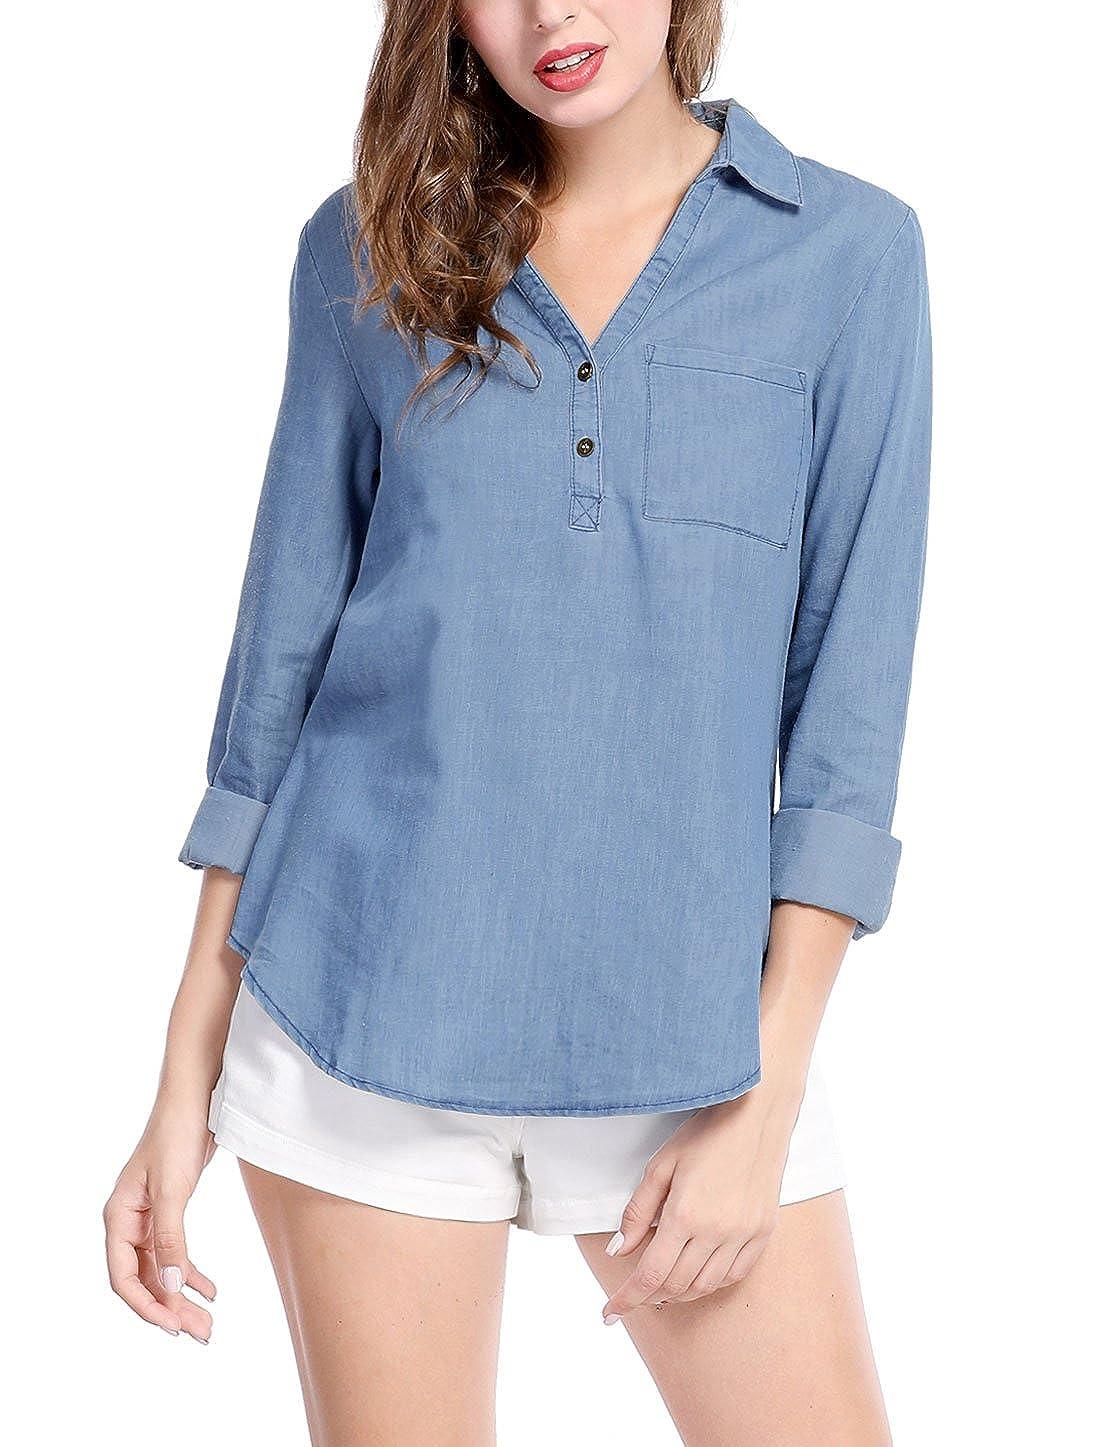 ebf5e946d69d23 Allegra K Women's V Neck Turn Down Collar Shirt Top Half Placket Chest  Pocket Blouse at Amazon Women's Clothing store: